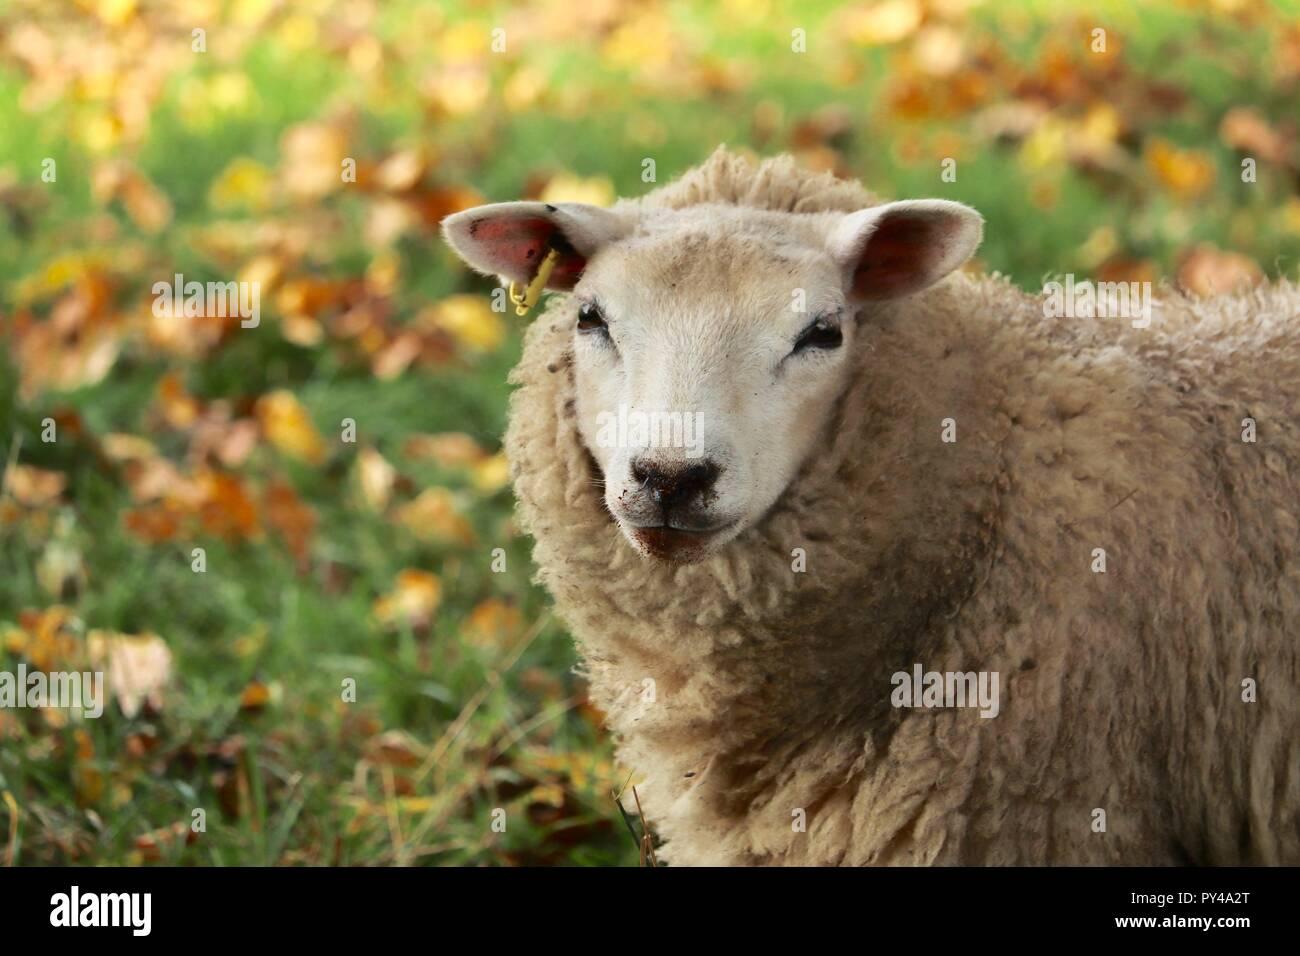 Black Nose Of Sheep Stock Photos Black Nose Of Sheep Stock